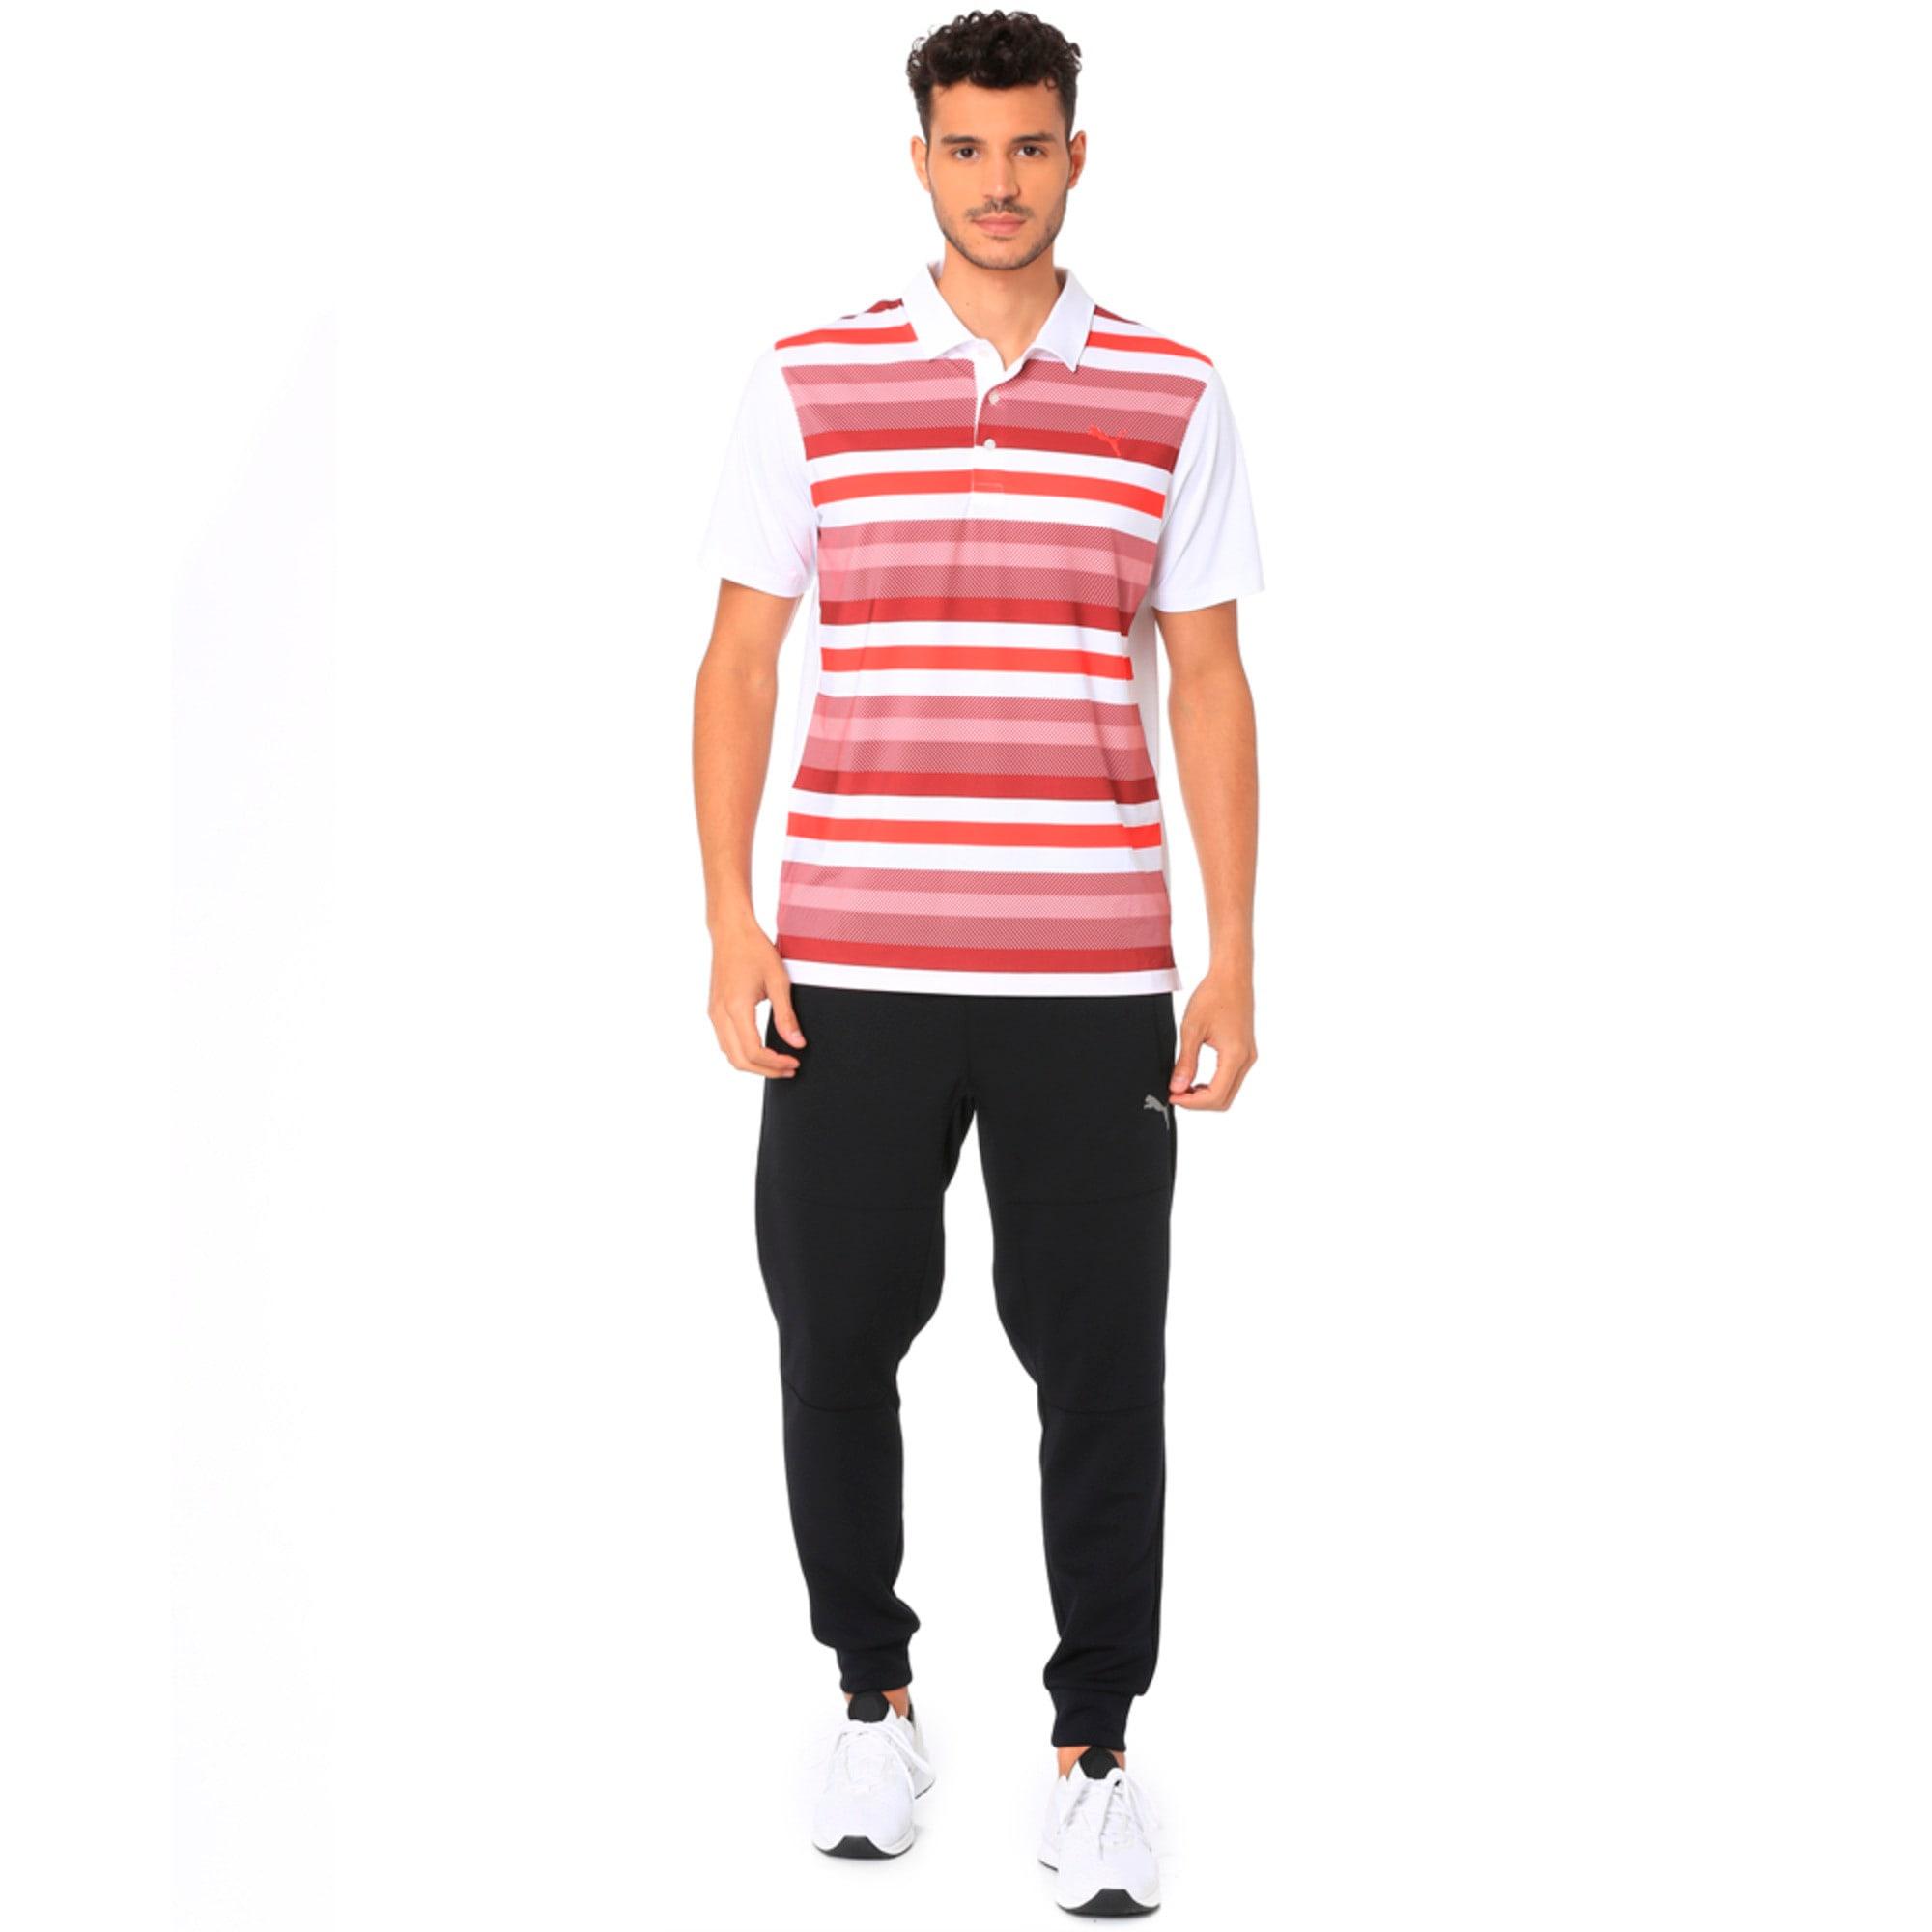 Thumbnail 2 of Golf Men's Turf Stripe Polo, Bright White-Pomegranate, medium-IND